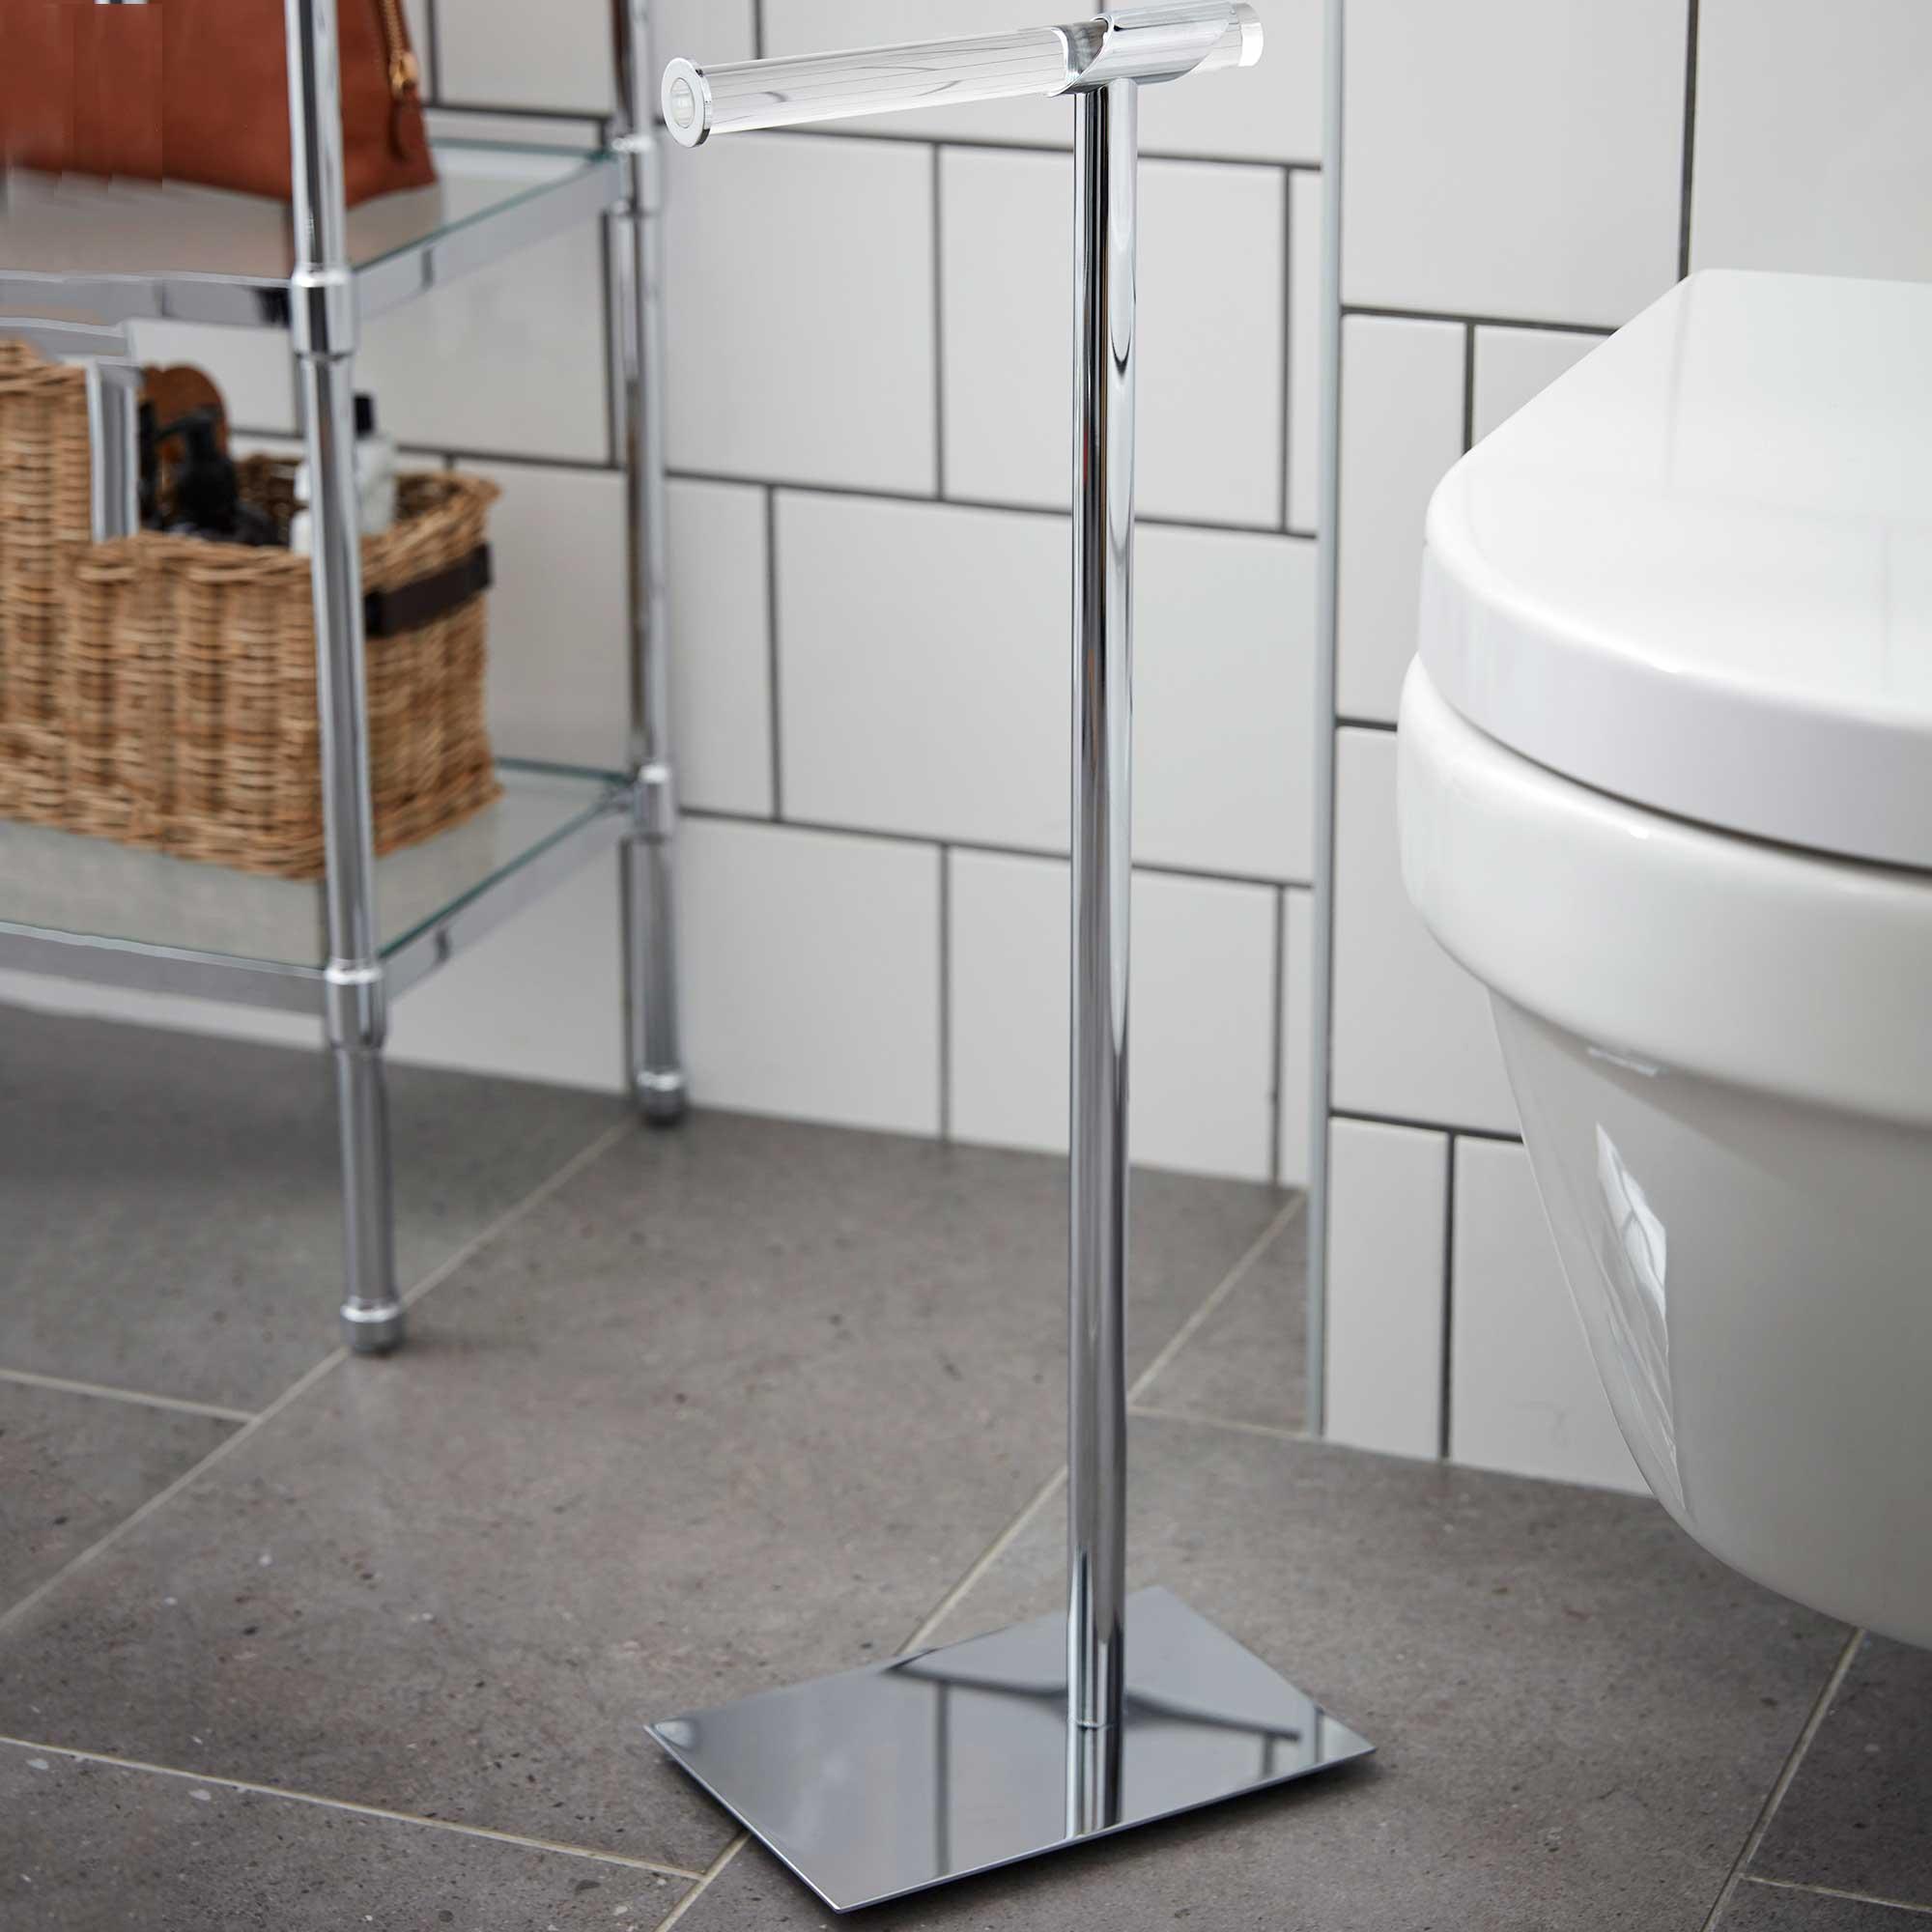 Toalettpappershållare Miller Badrum Classic Fristående